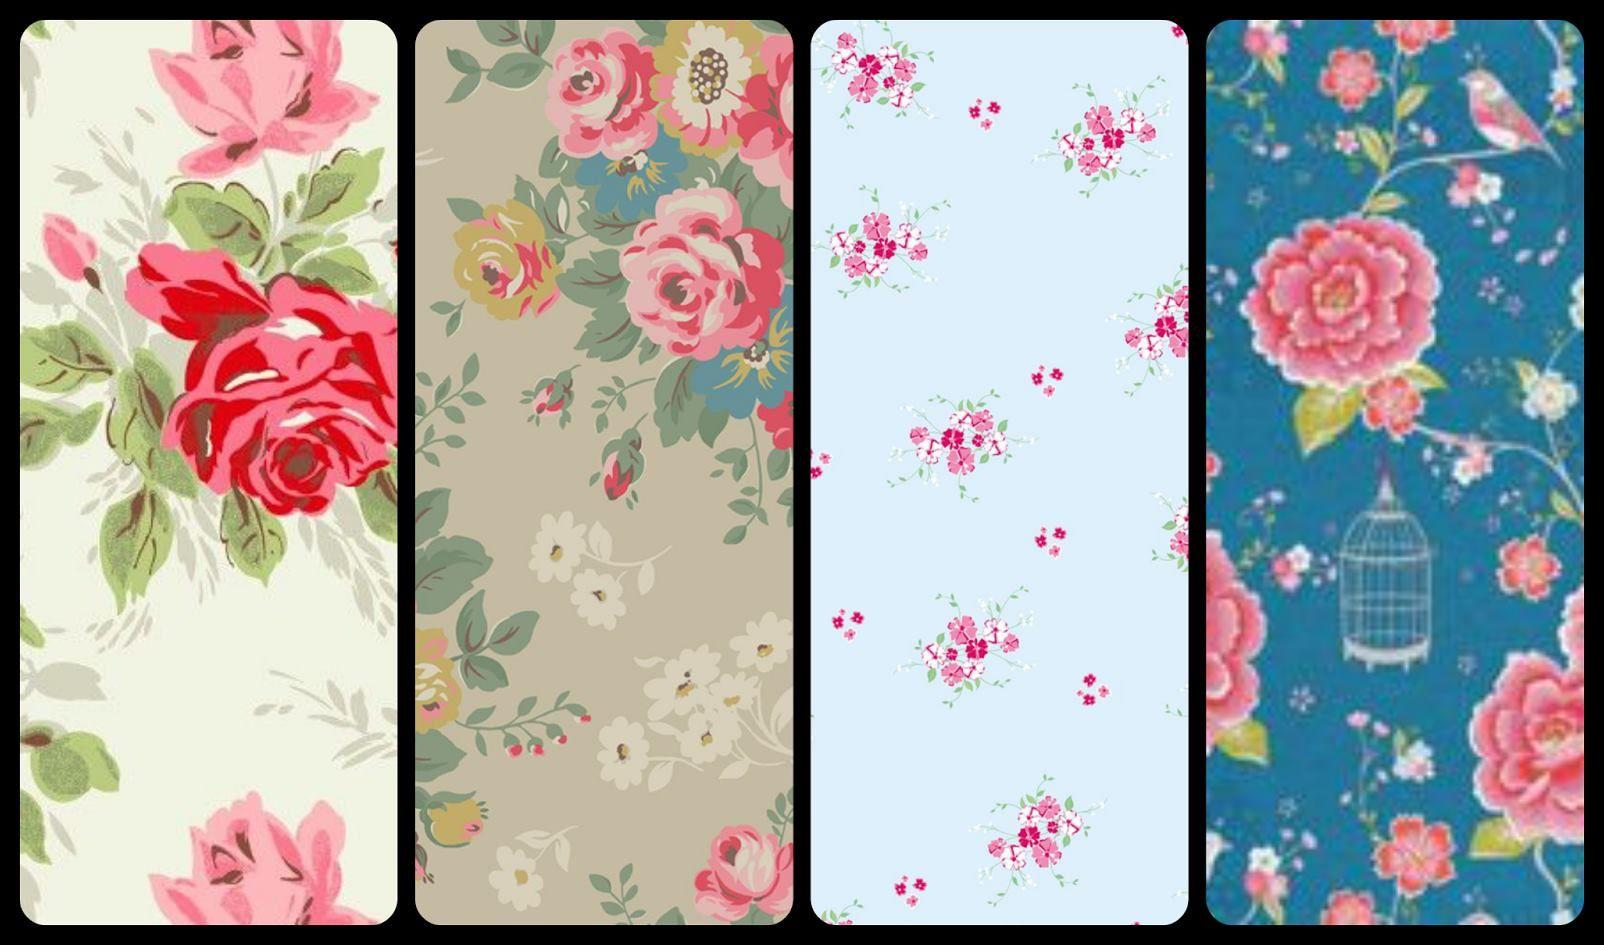 Fondos De Flores Wallpapers Hd Gratis: Fondos De Flores Para Celular En Hd Gratis Para Poner En